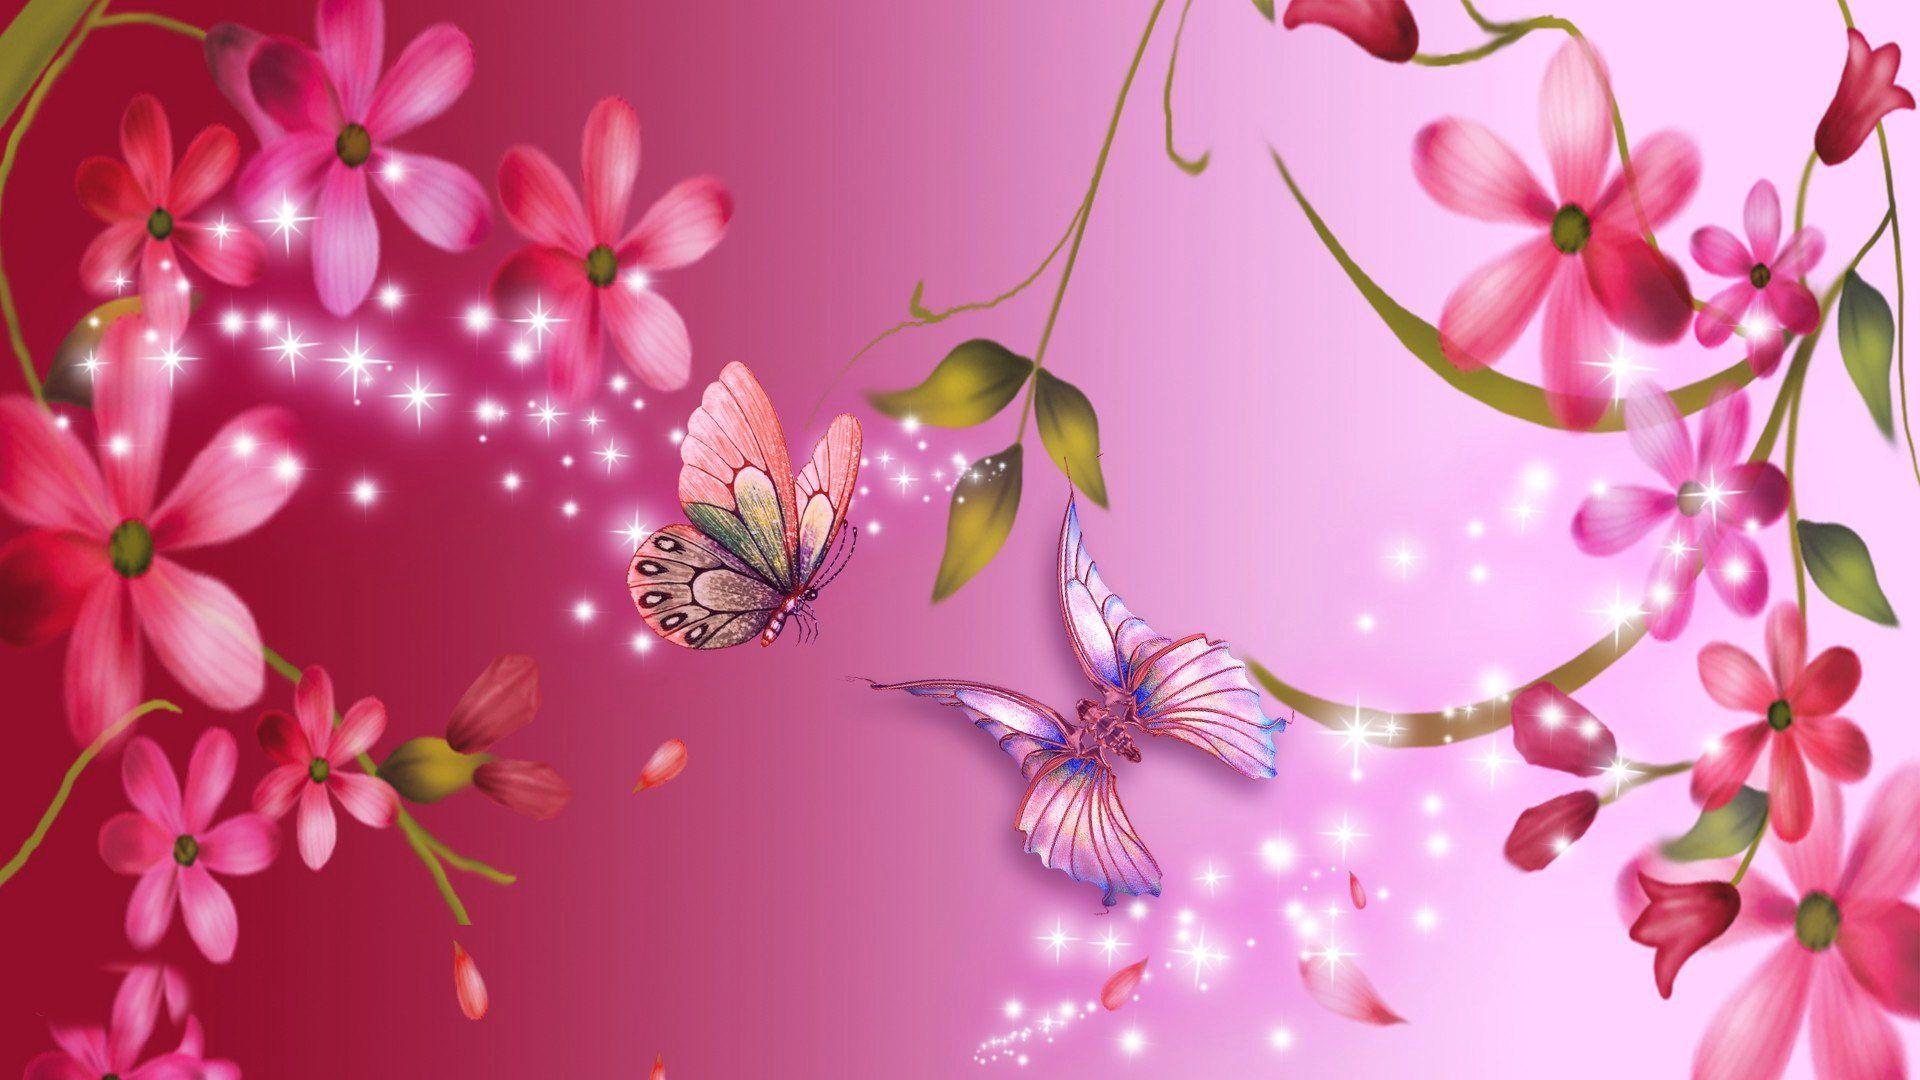 Pink Flower Wallpapers 1080p For Desktop Wallpaper 1920 x